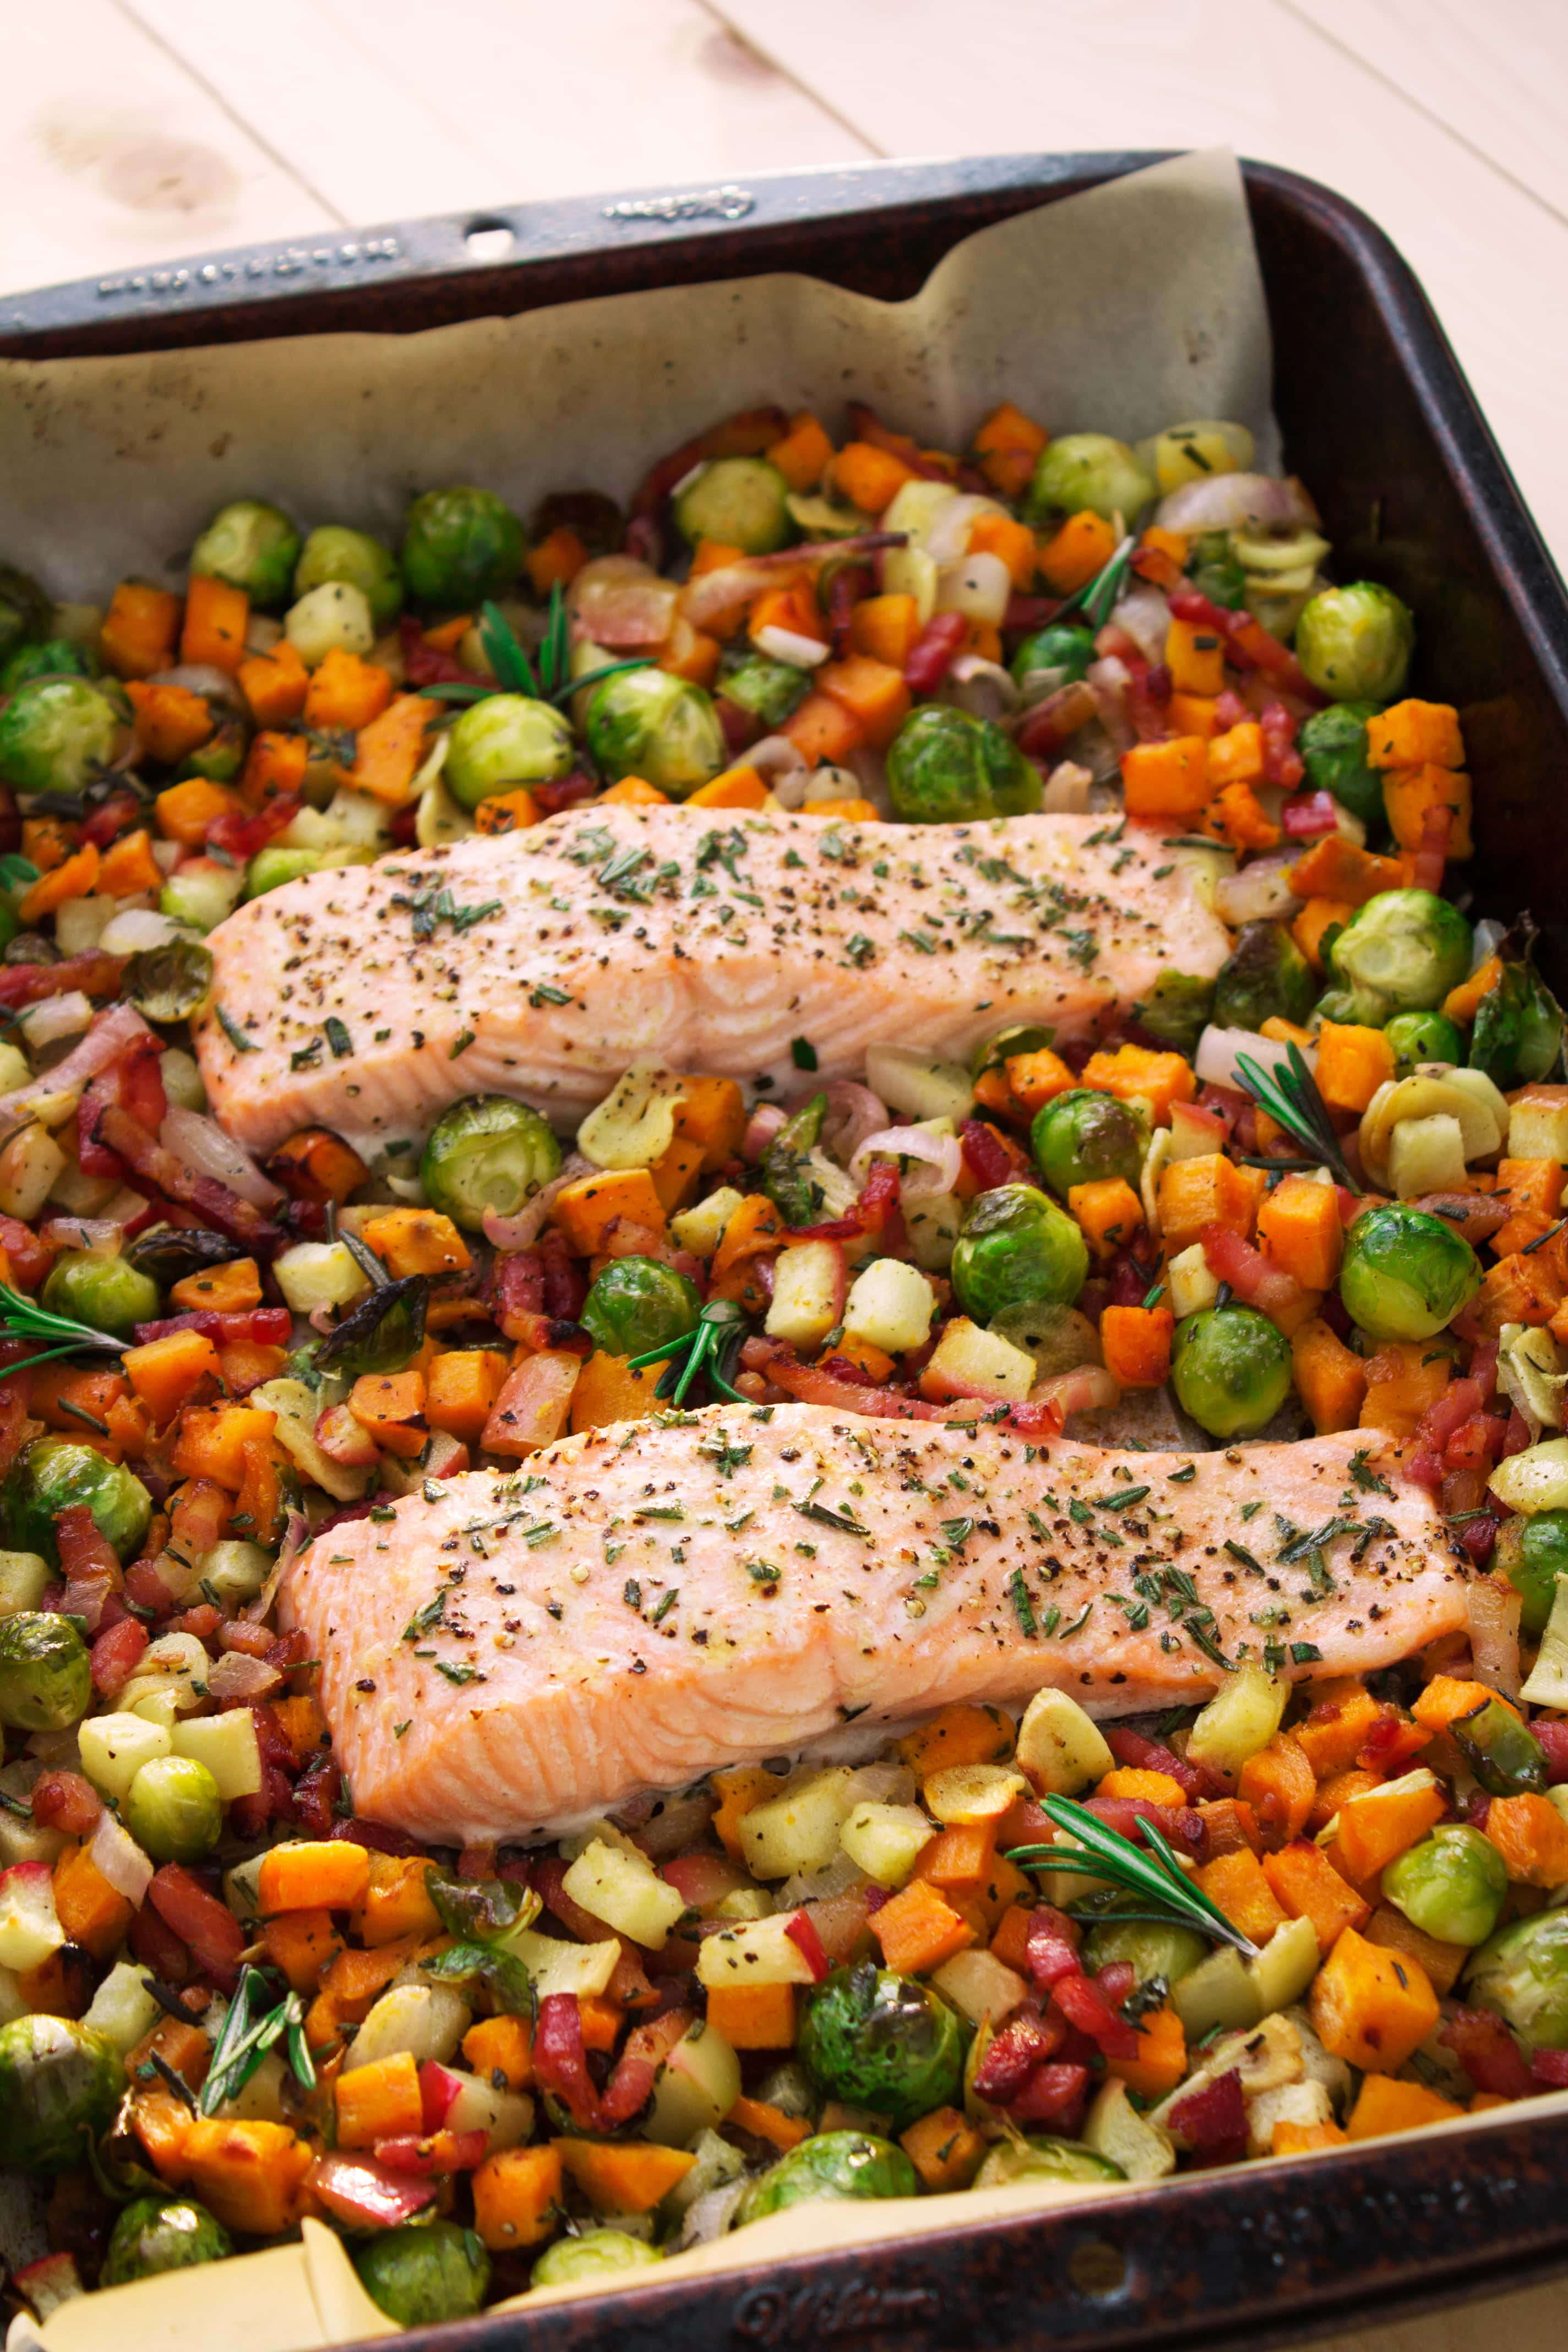 One Pan Salmon with Sweet Potato, Bacon, Apple, & Brussels Sprouts | Kit's Coastal | #kitscoastal #coastalpaleo #paleo #glutenfree #dairyfree #salmon #onepan #sheetpan